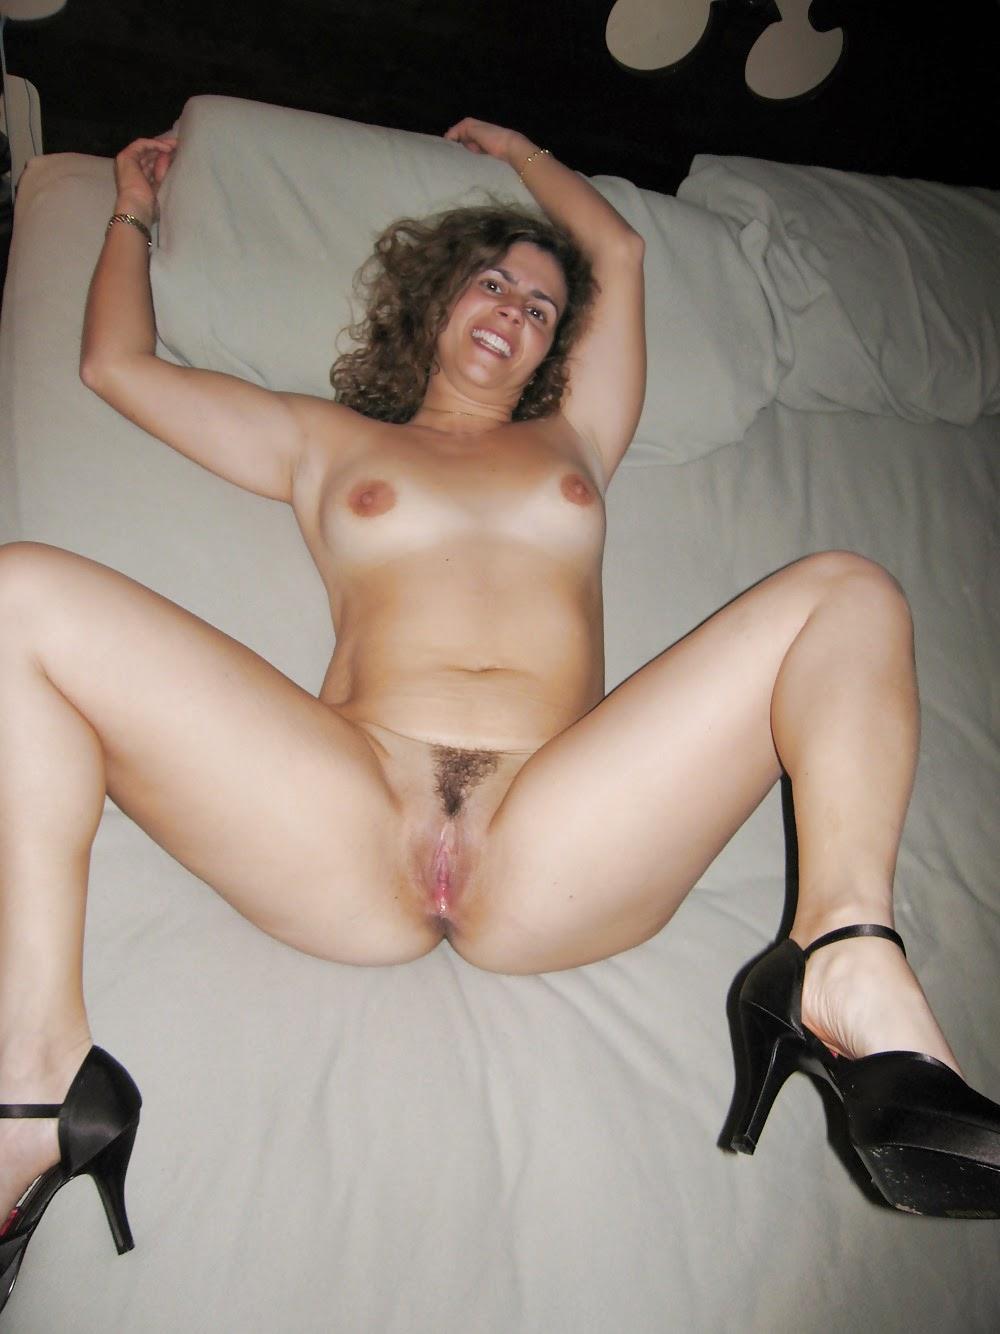 Stories female exhibitionist